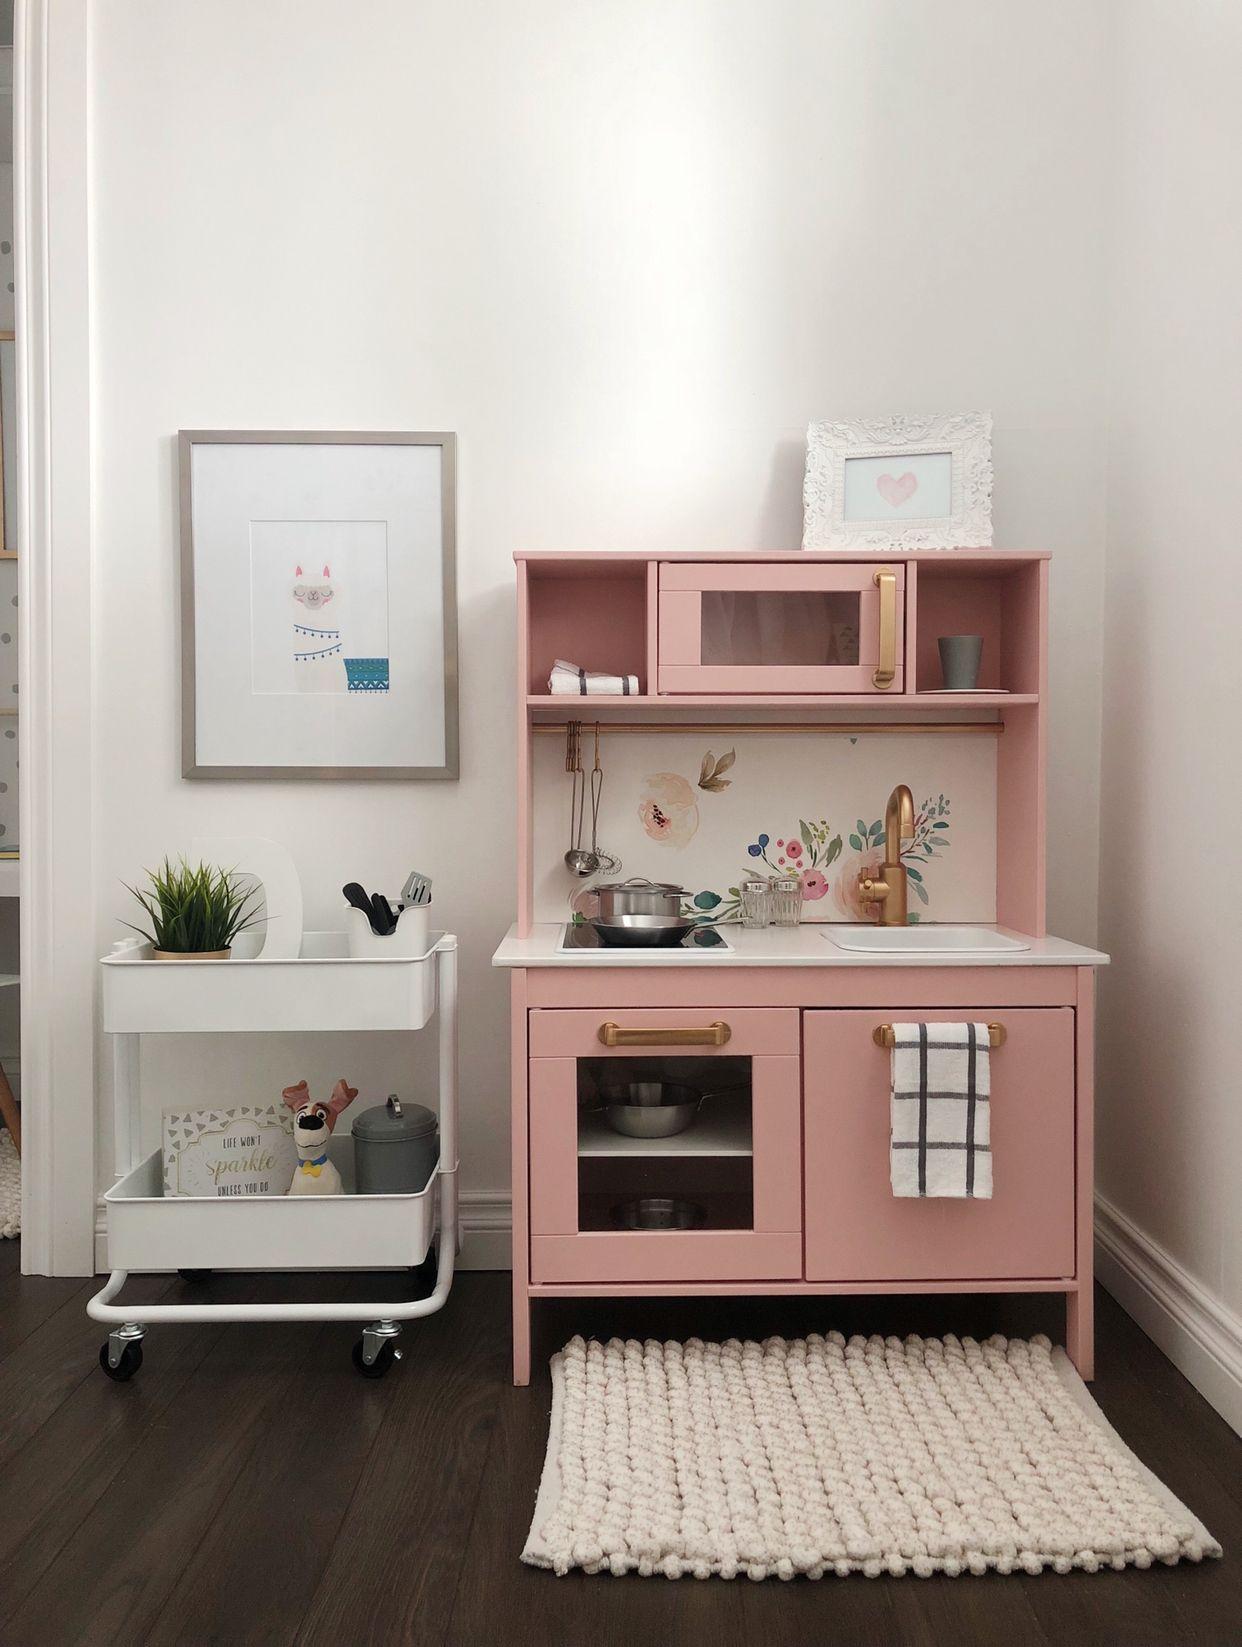 IKEA Duktig kitchen hack. | kinderhoek woonkamer | Pinterest | Ikea ...